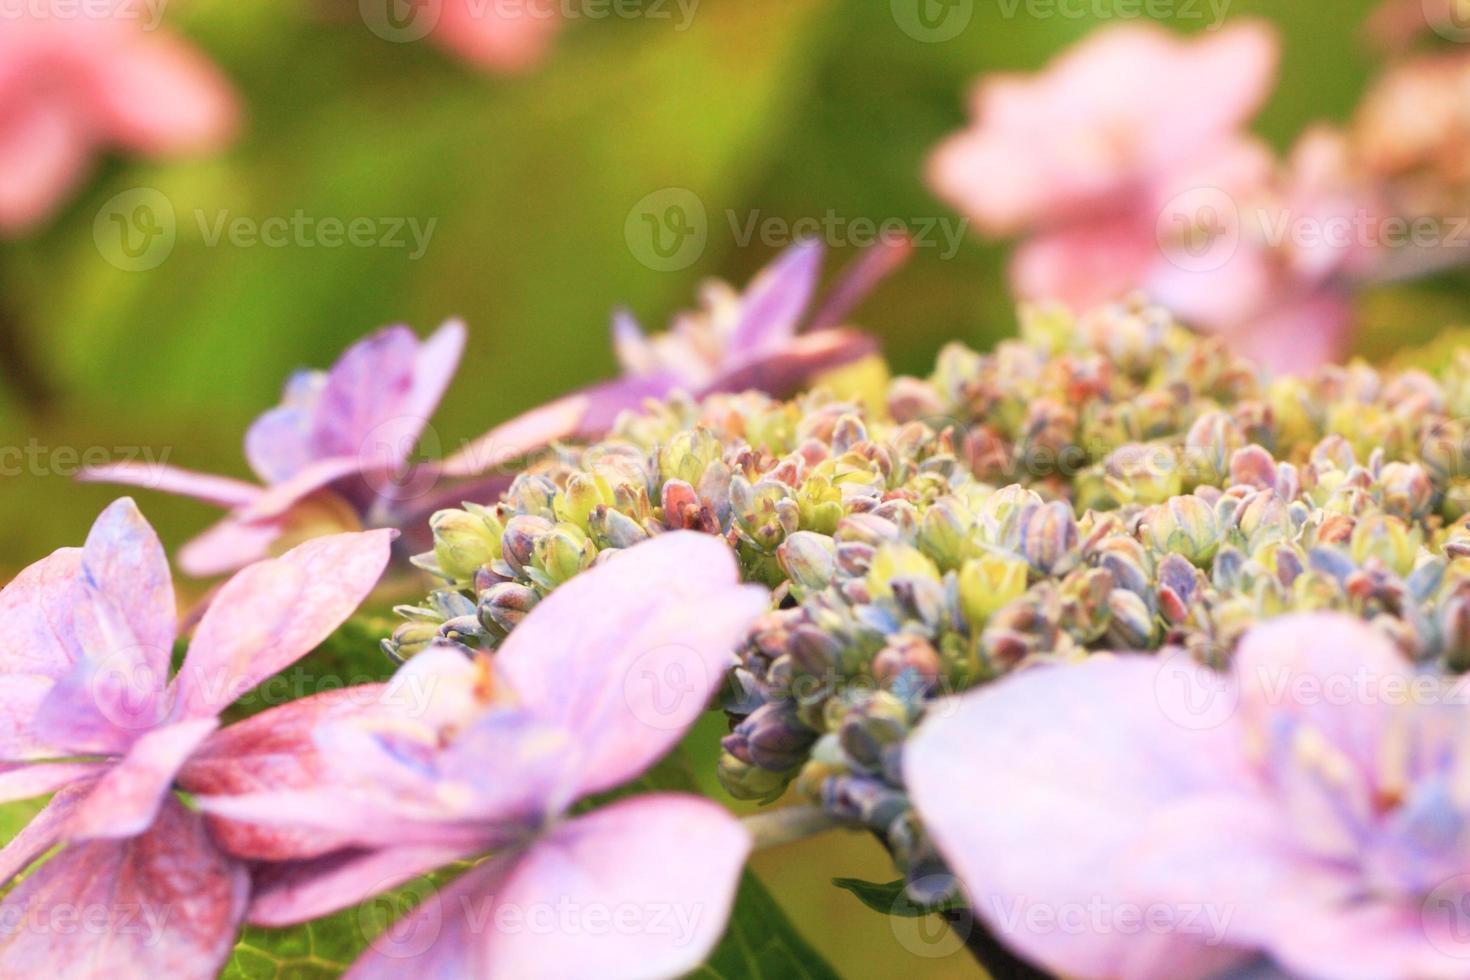 hortensia bloem close-up foto